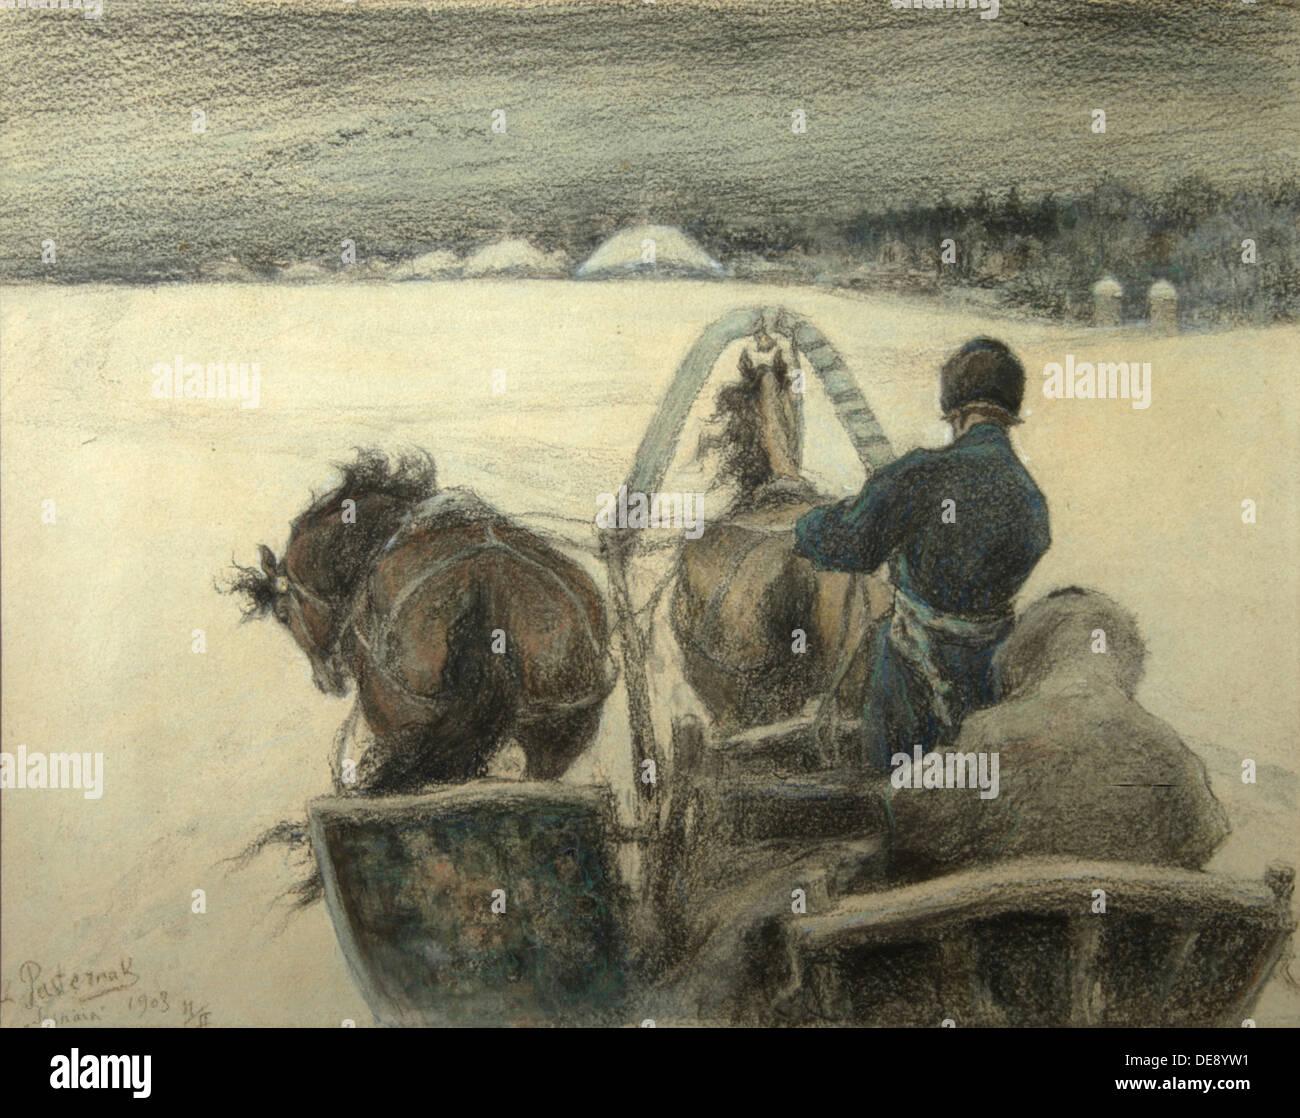 On the Road to Yasnaya Polyana, 1903. Artist: Pasternak, Leonid Osipovich (1862-1945) Stock Photo